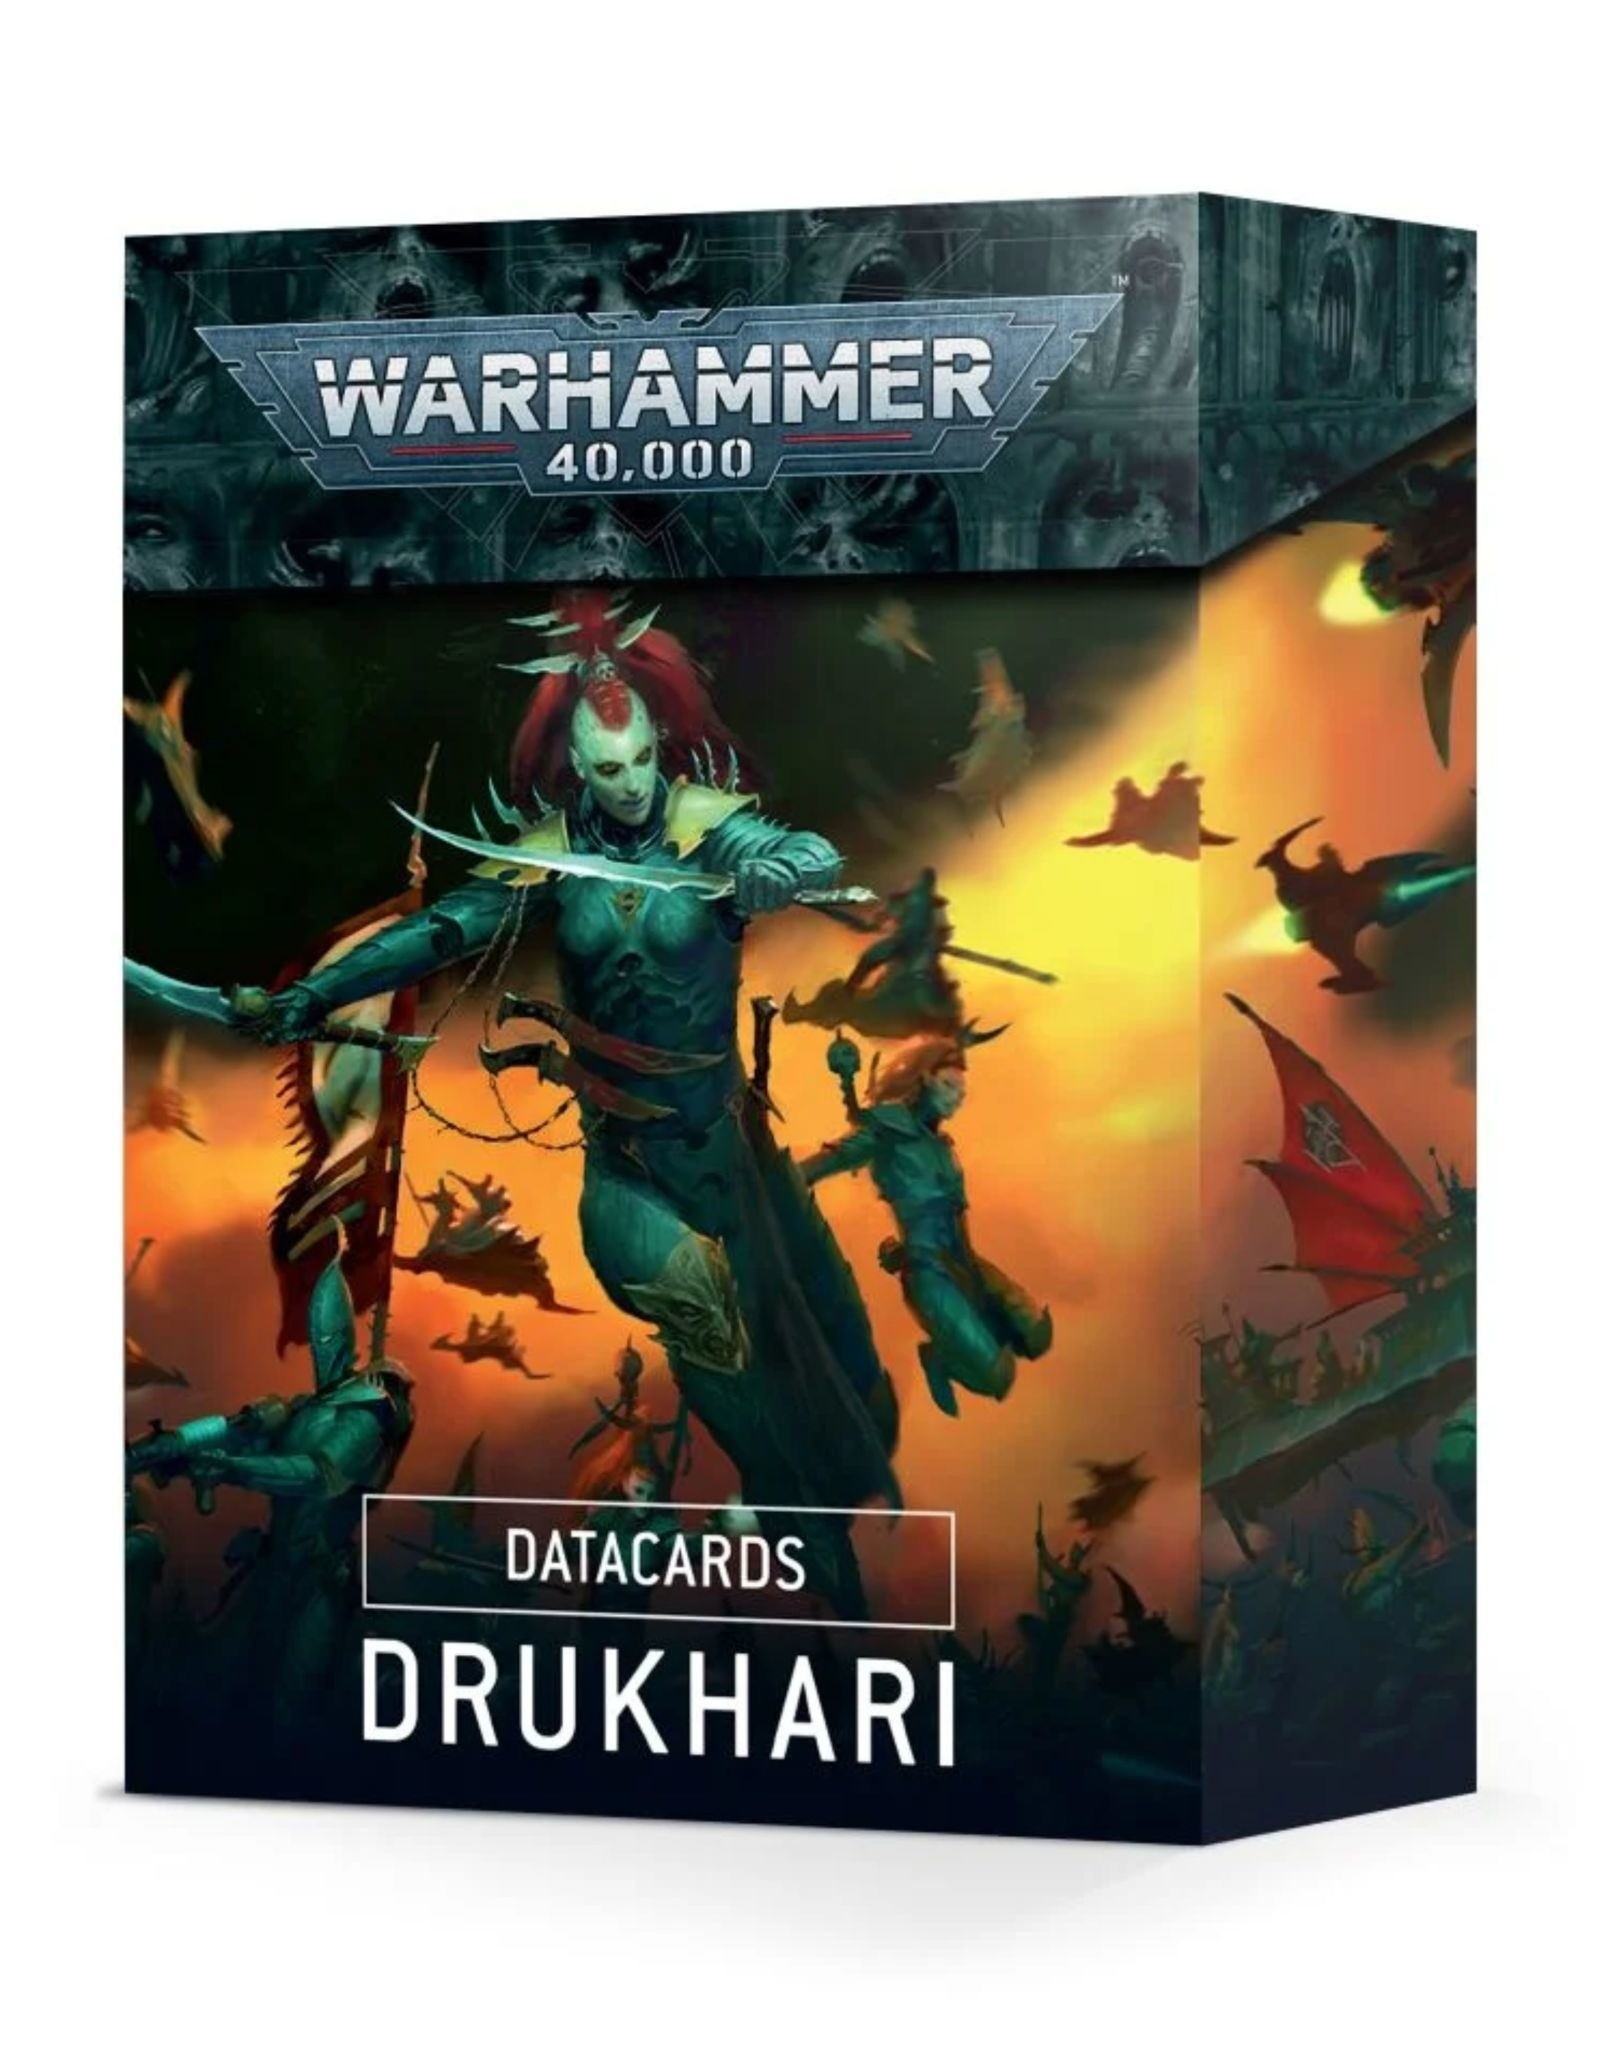 Warhammer 40k Data Cards Drukhari (9th Edition)